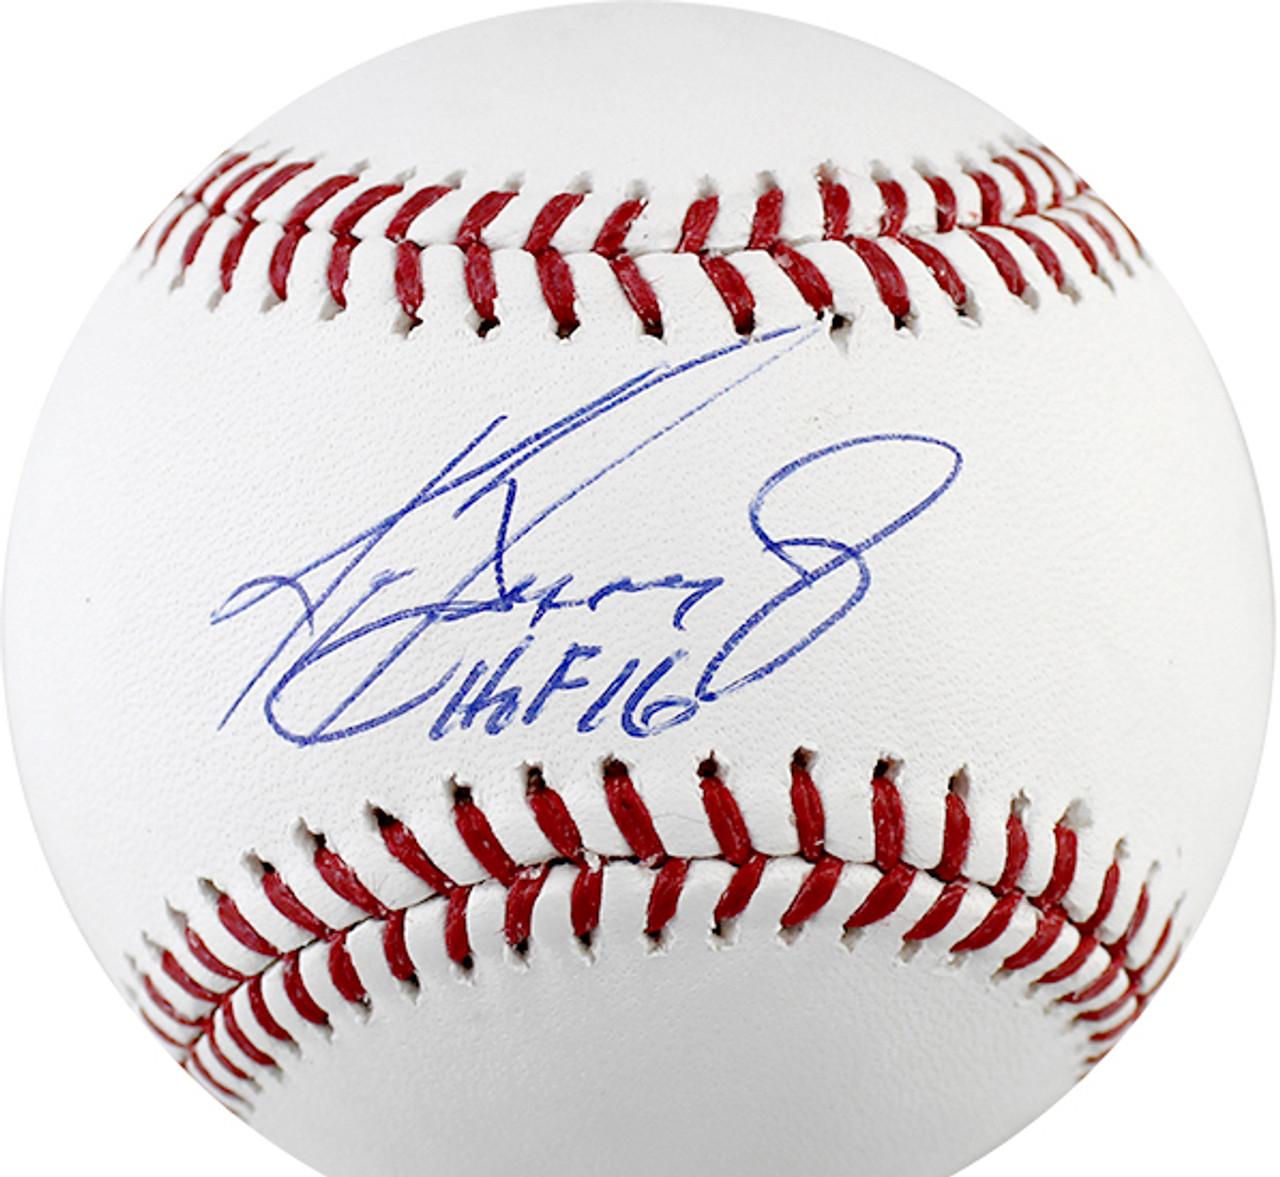 Autographs-original Randy Johnson All Star Game Autograph Baseball Coa Rare Ny Yankees Must Have Sports Mem, Cards & Fan Shop